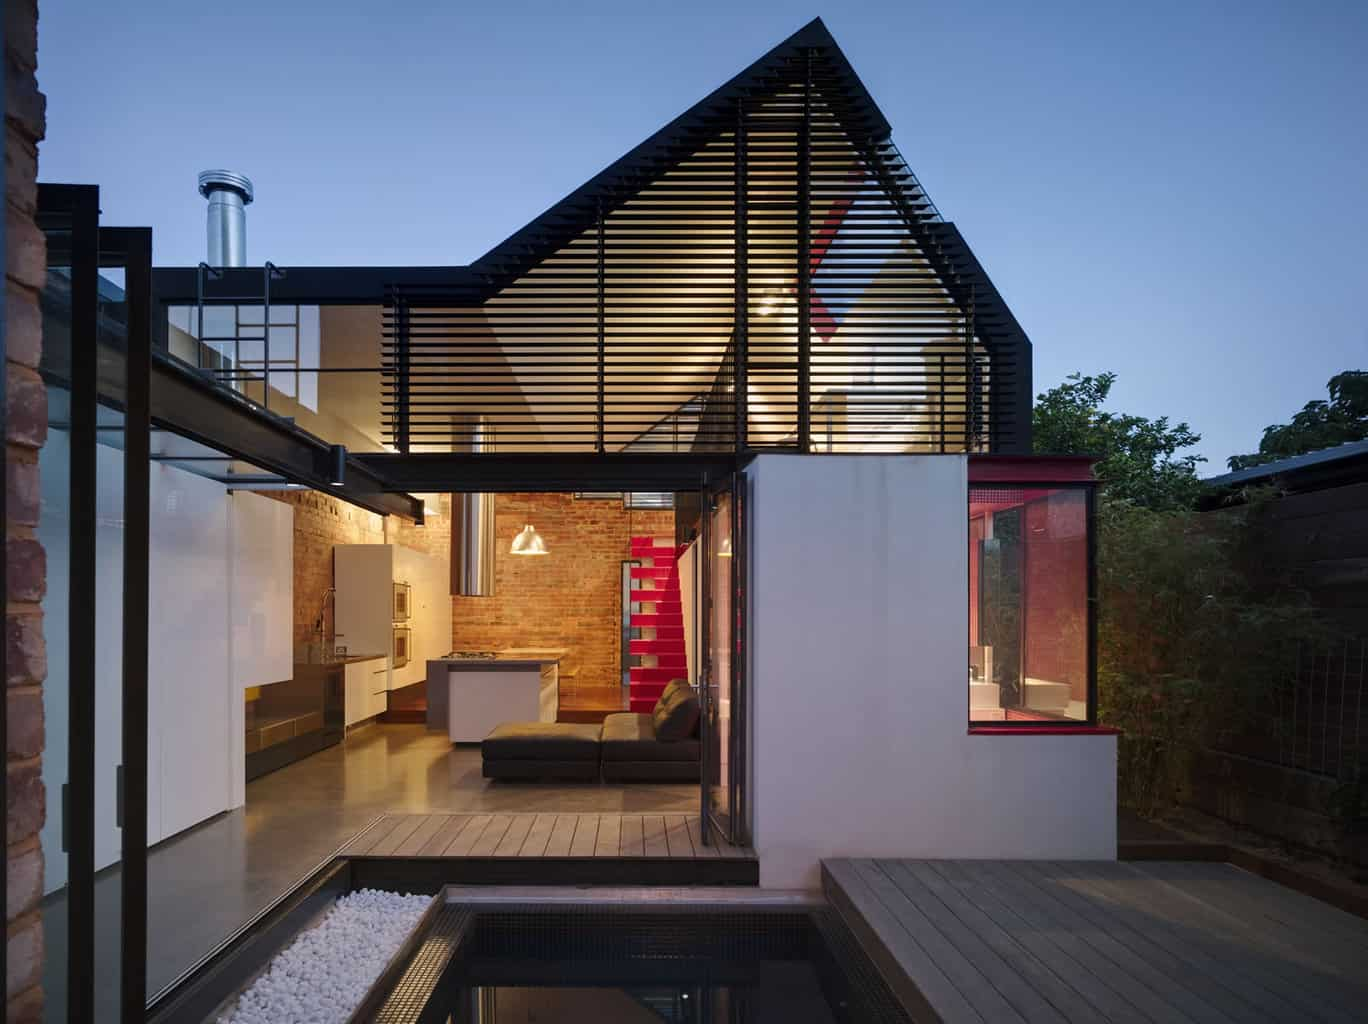 Creative architecture breathes new life into Victorian terrace